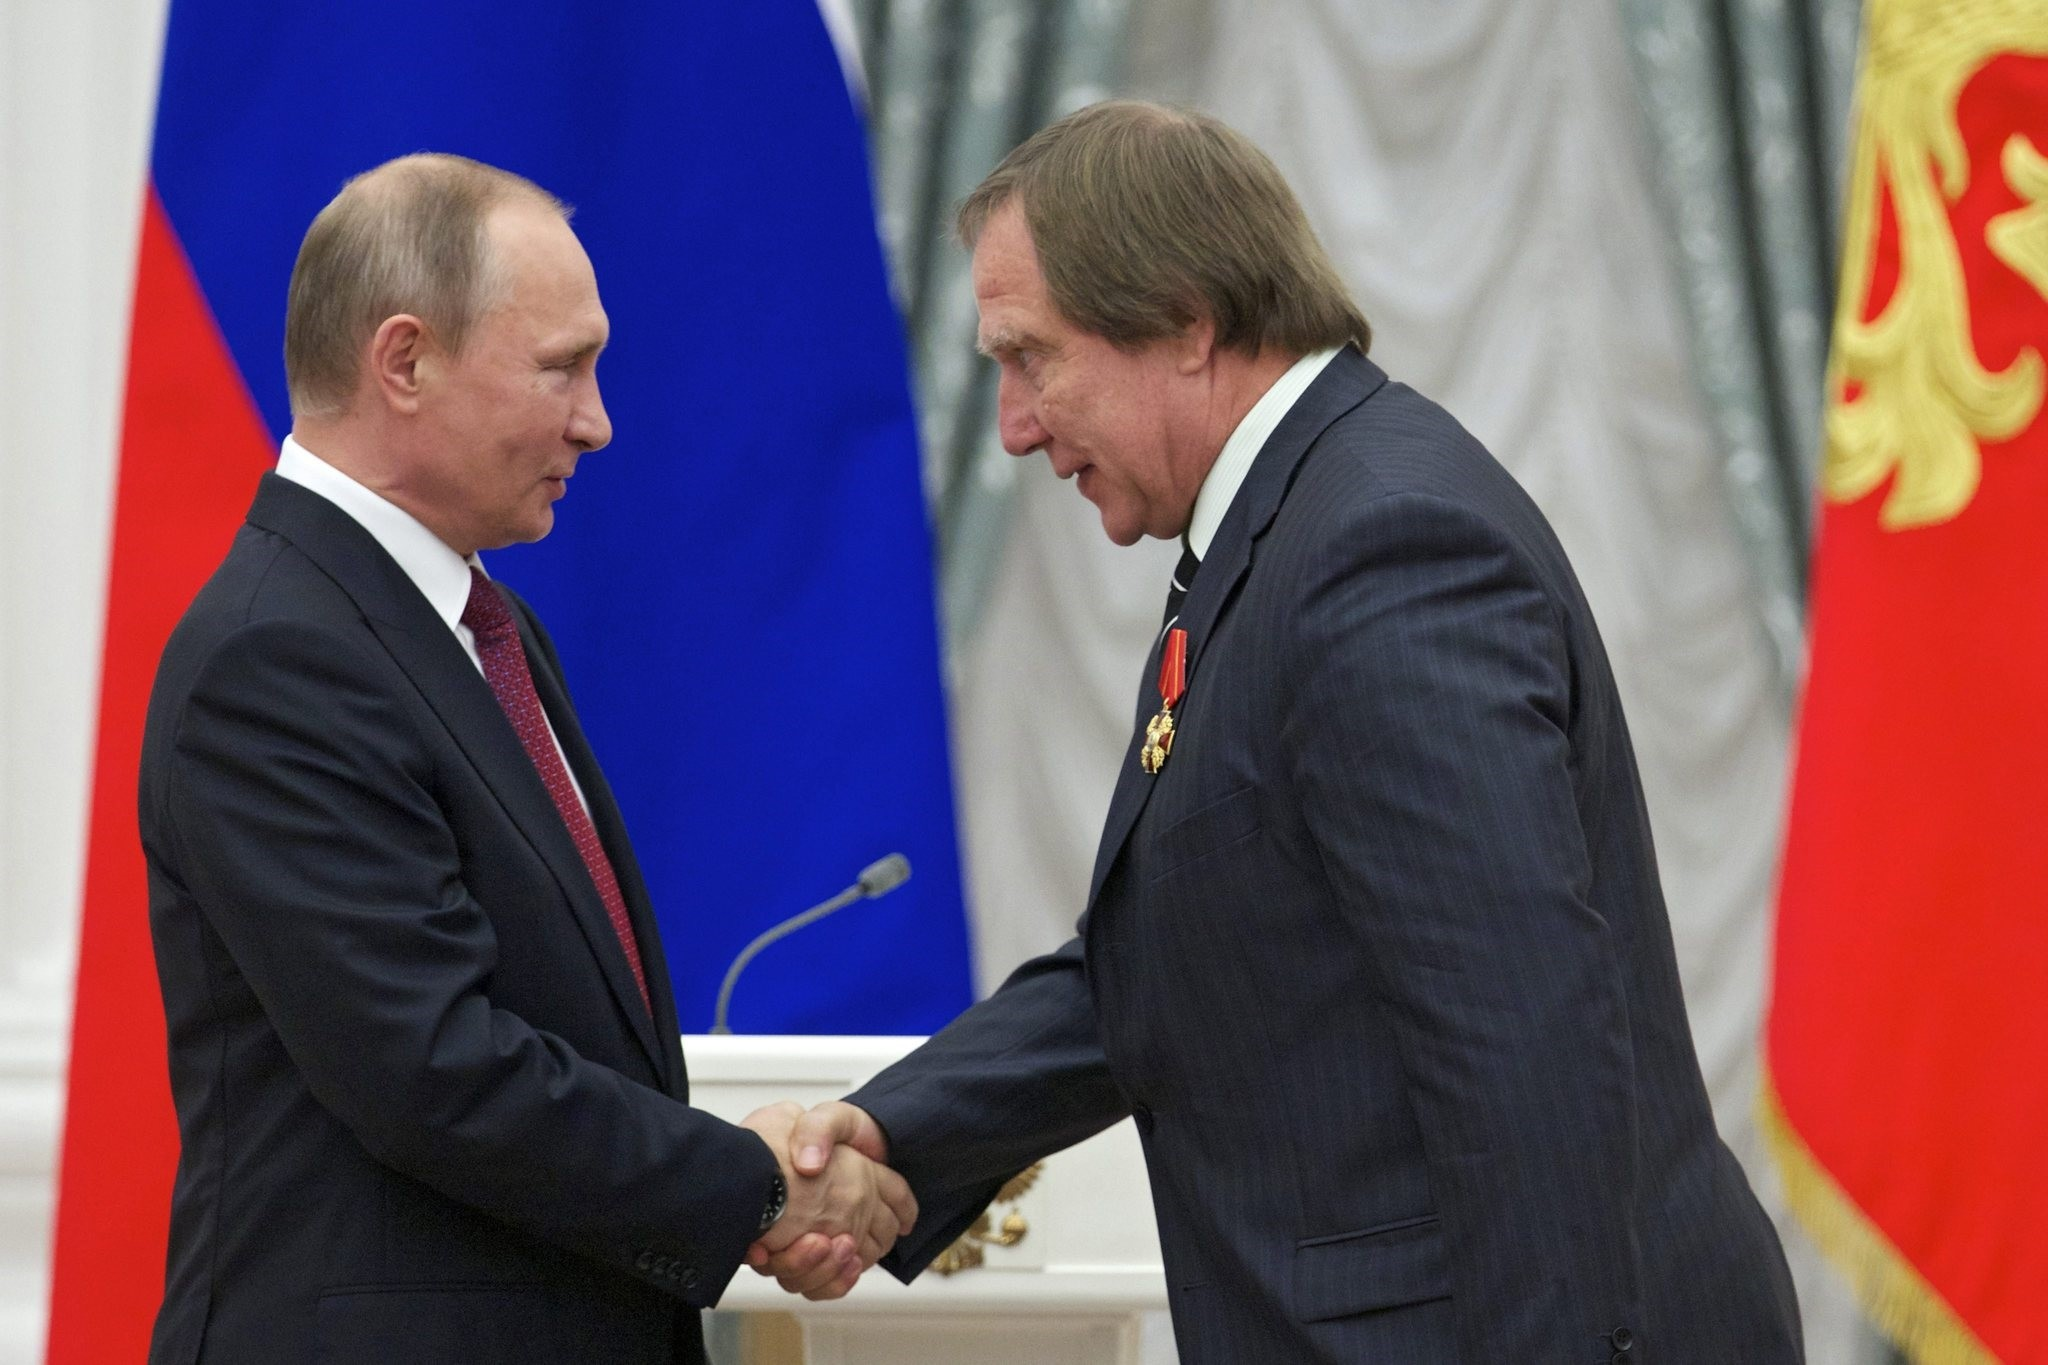 Sergei Roldugin, a childhood friend of Putin's.